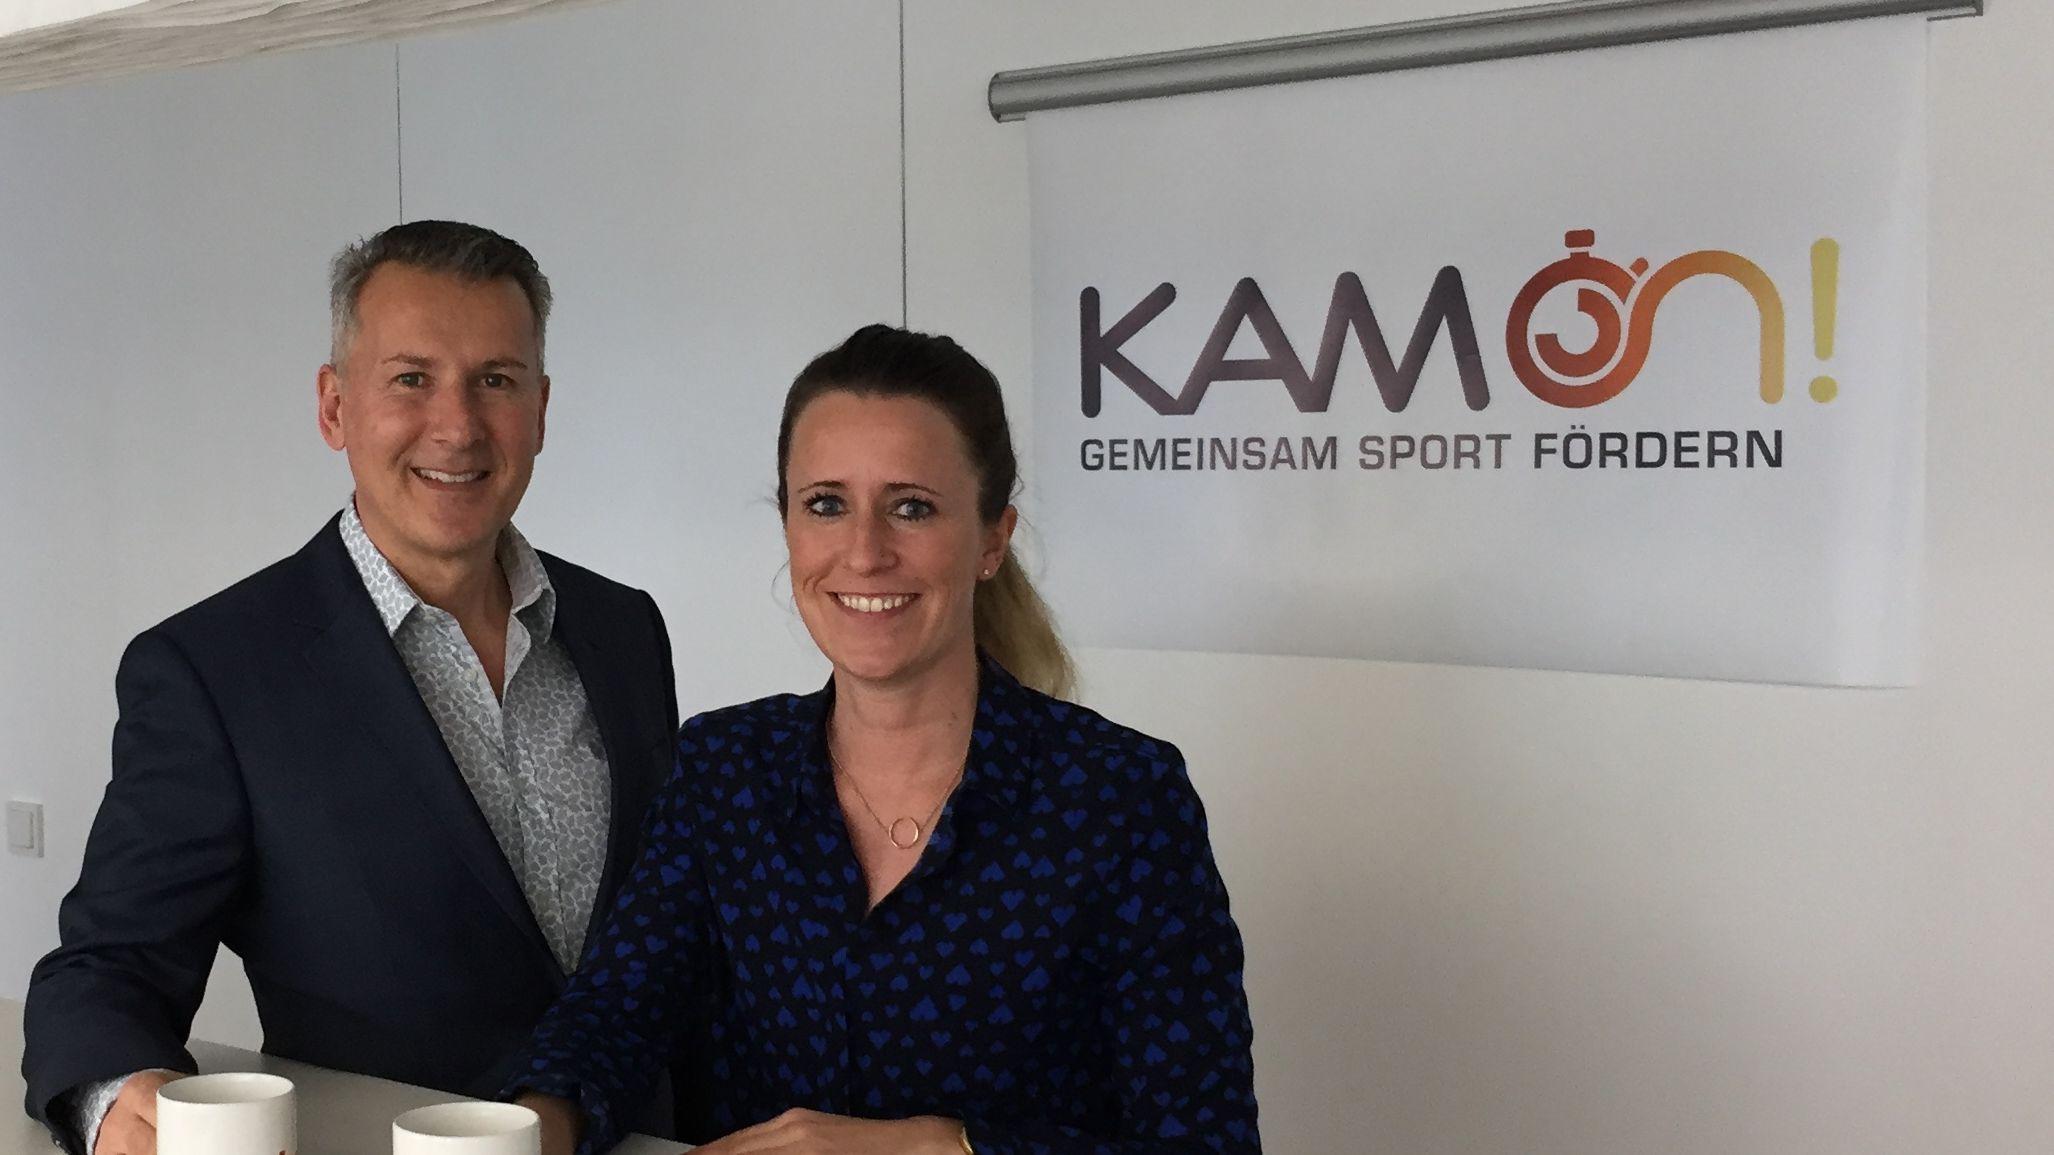 KAM-on-Gründer: Alex Jan Avedikjan und Kristina Kamper